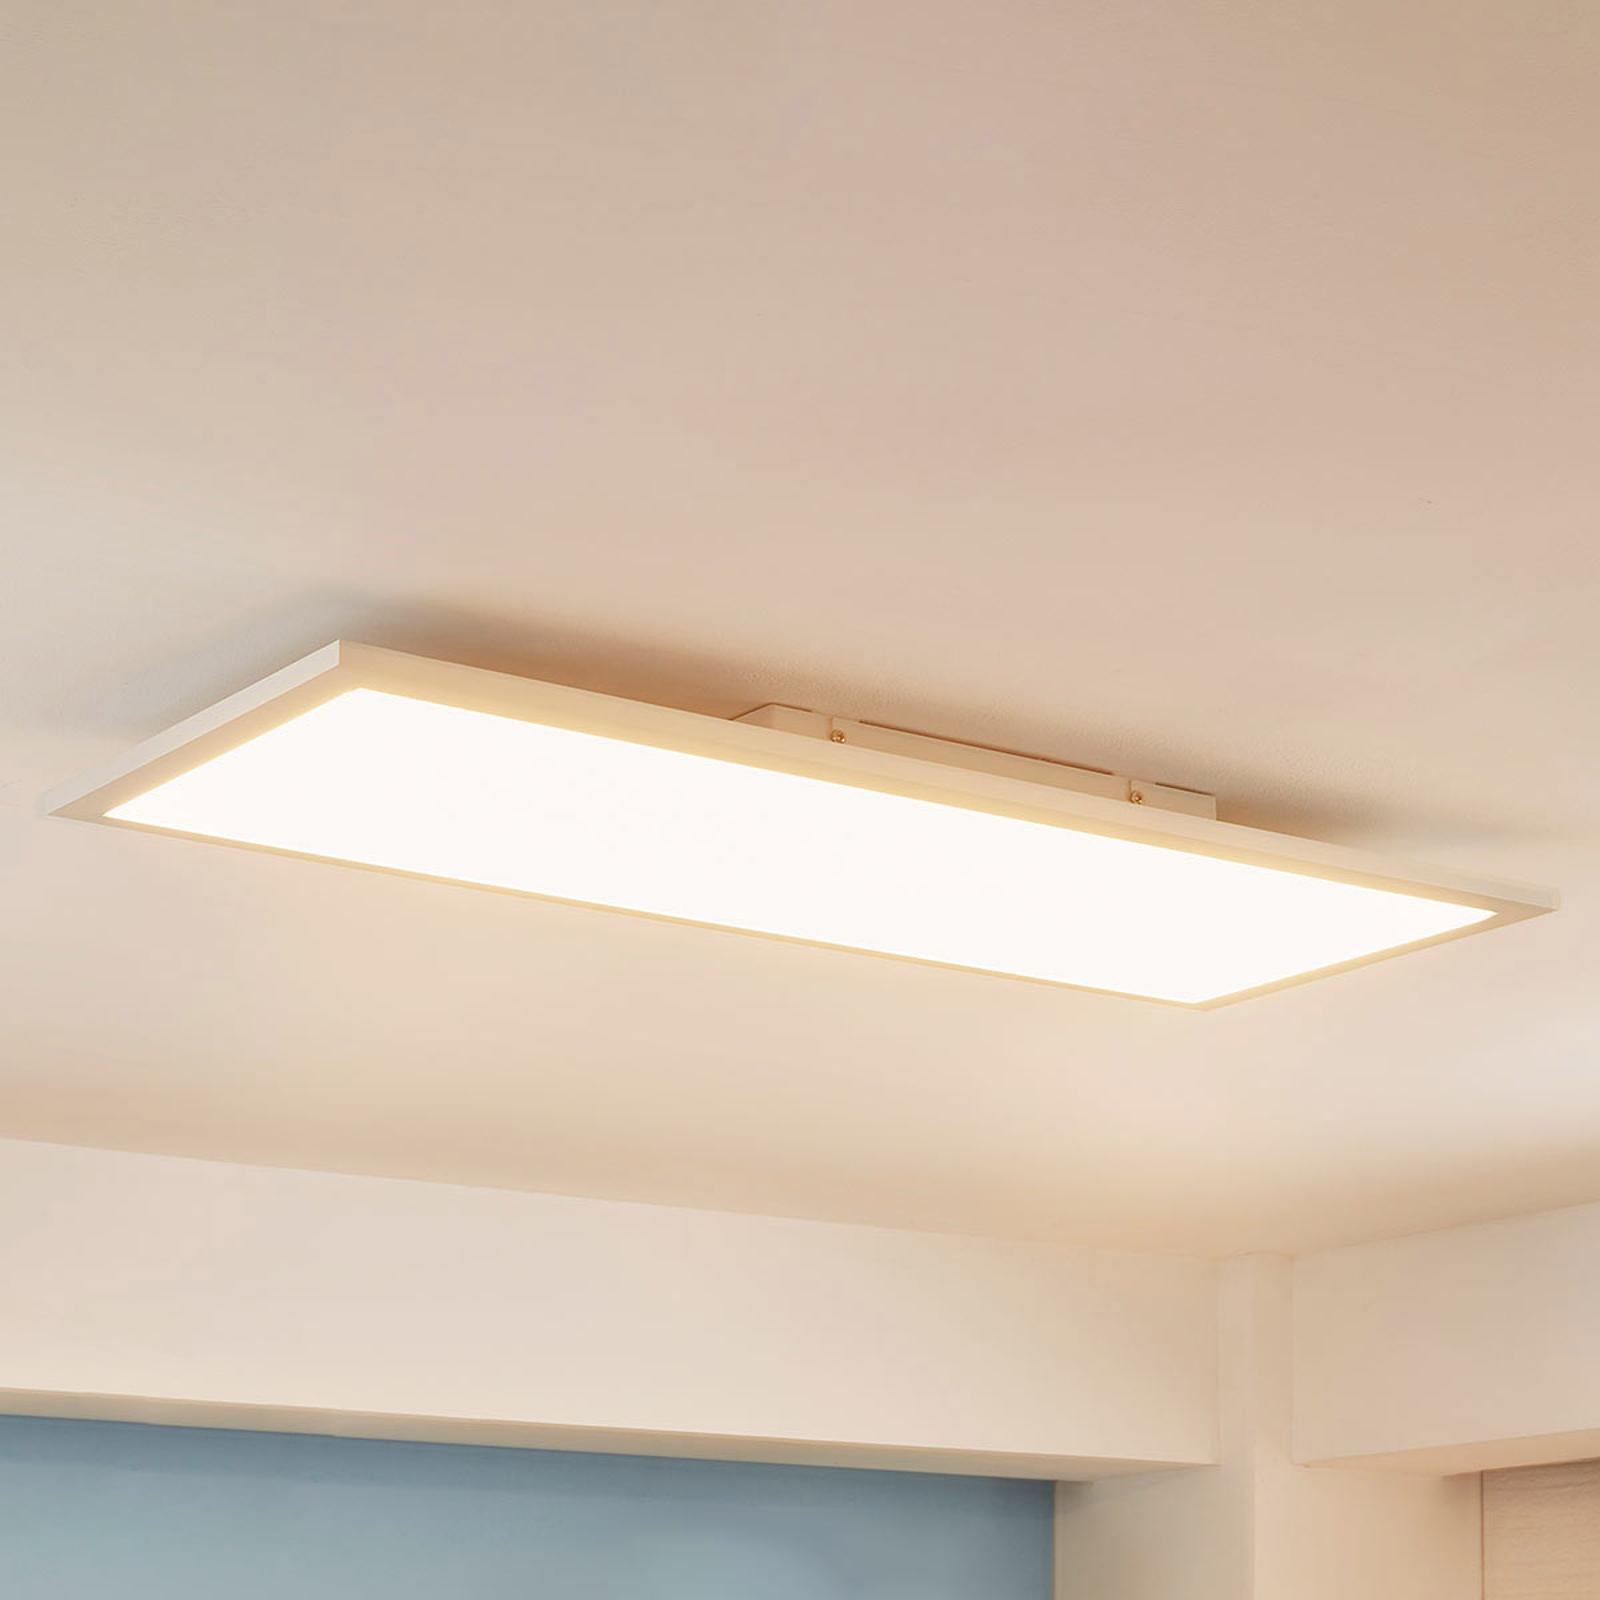 Elongated LED panel Enja, 30 x 80 cm_9621531_1